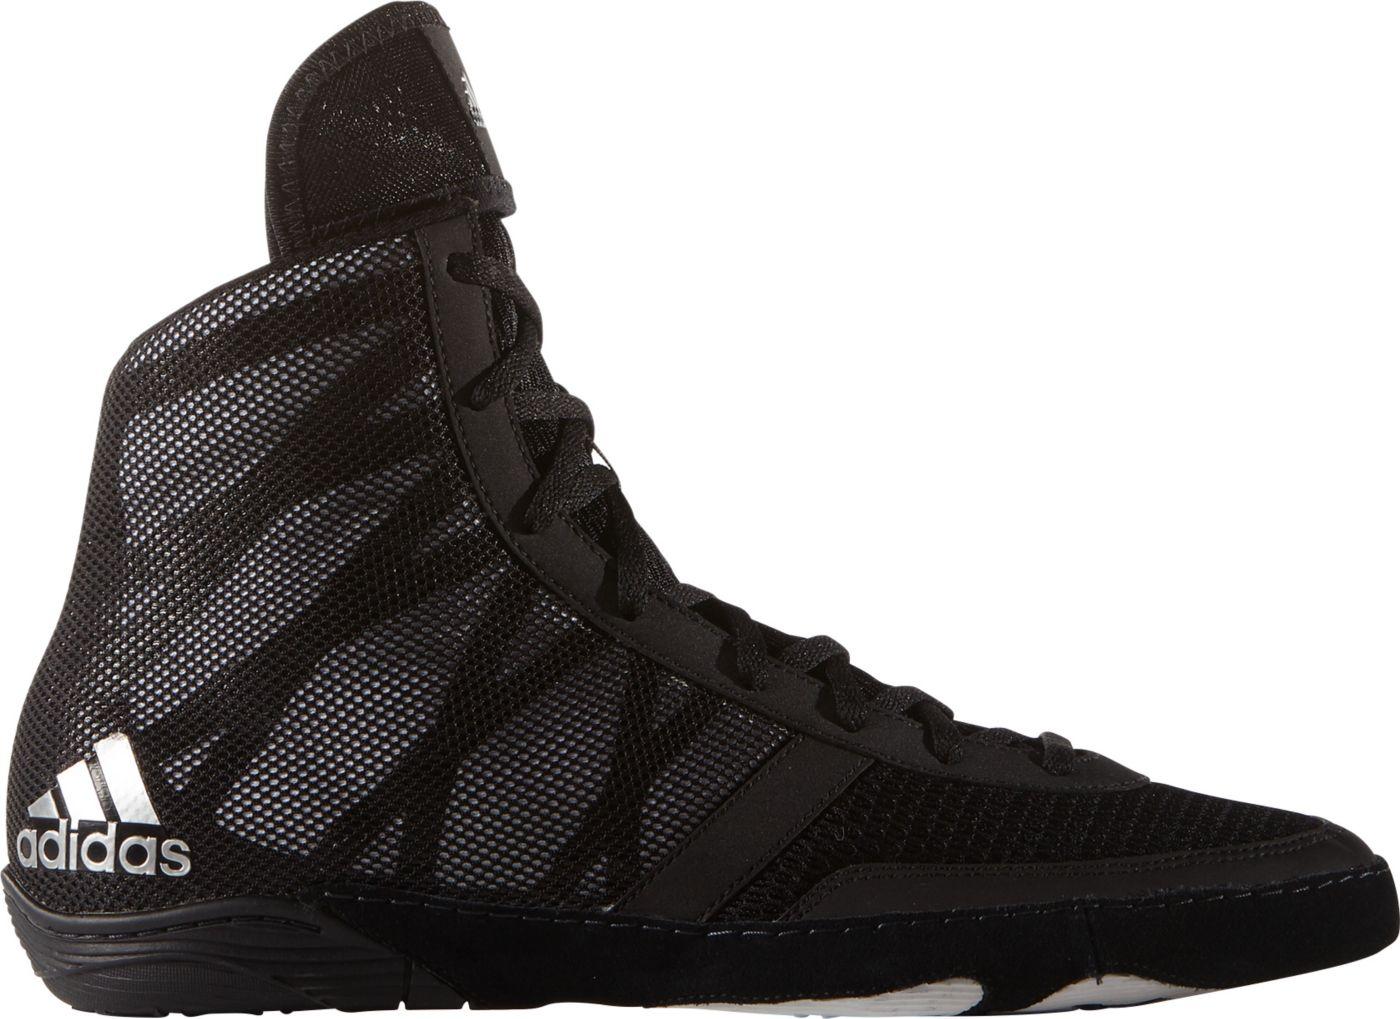 adidas Men's Pretereo III Wrestling Shoes